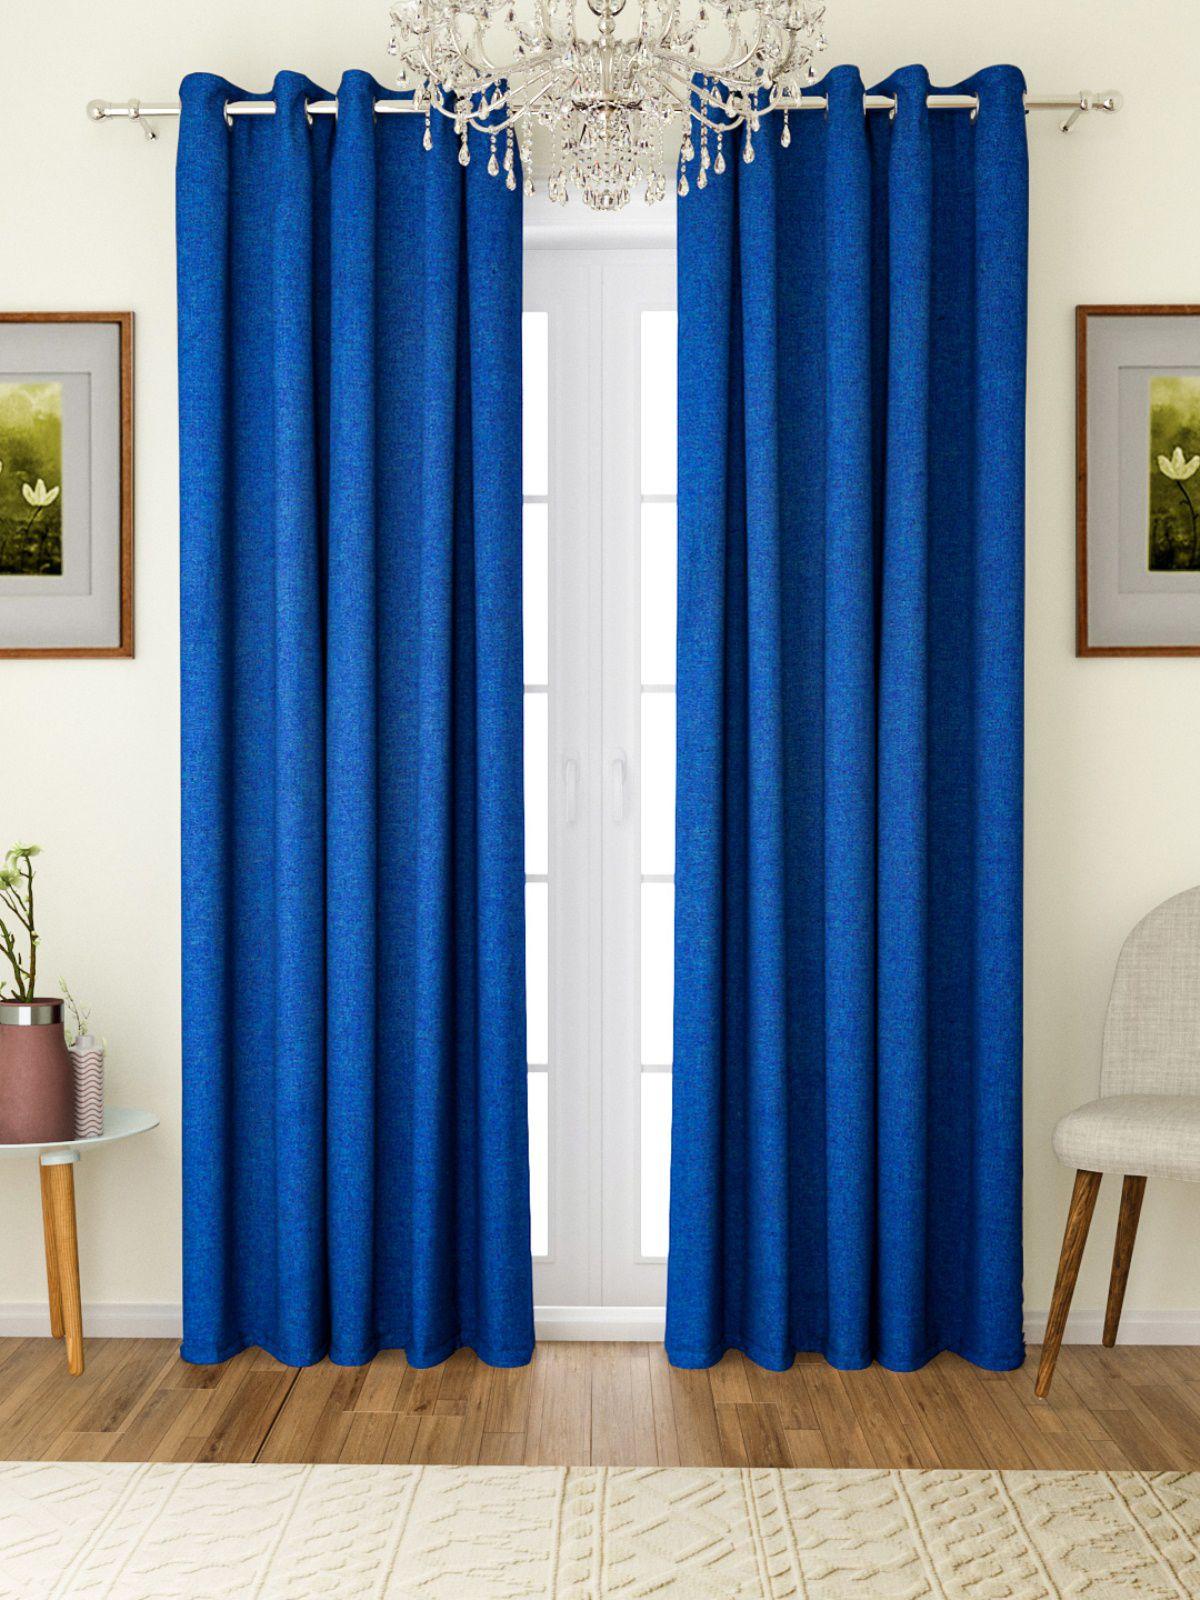 Romee Set of 2 Door Eyelet Polyester Curtains Blue